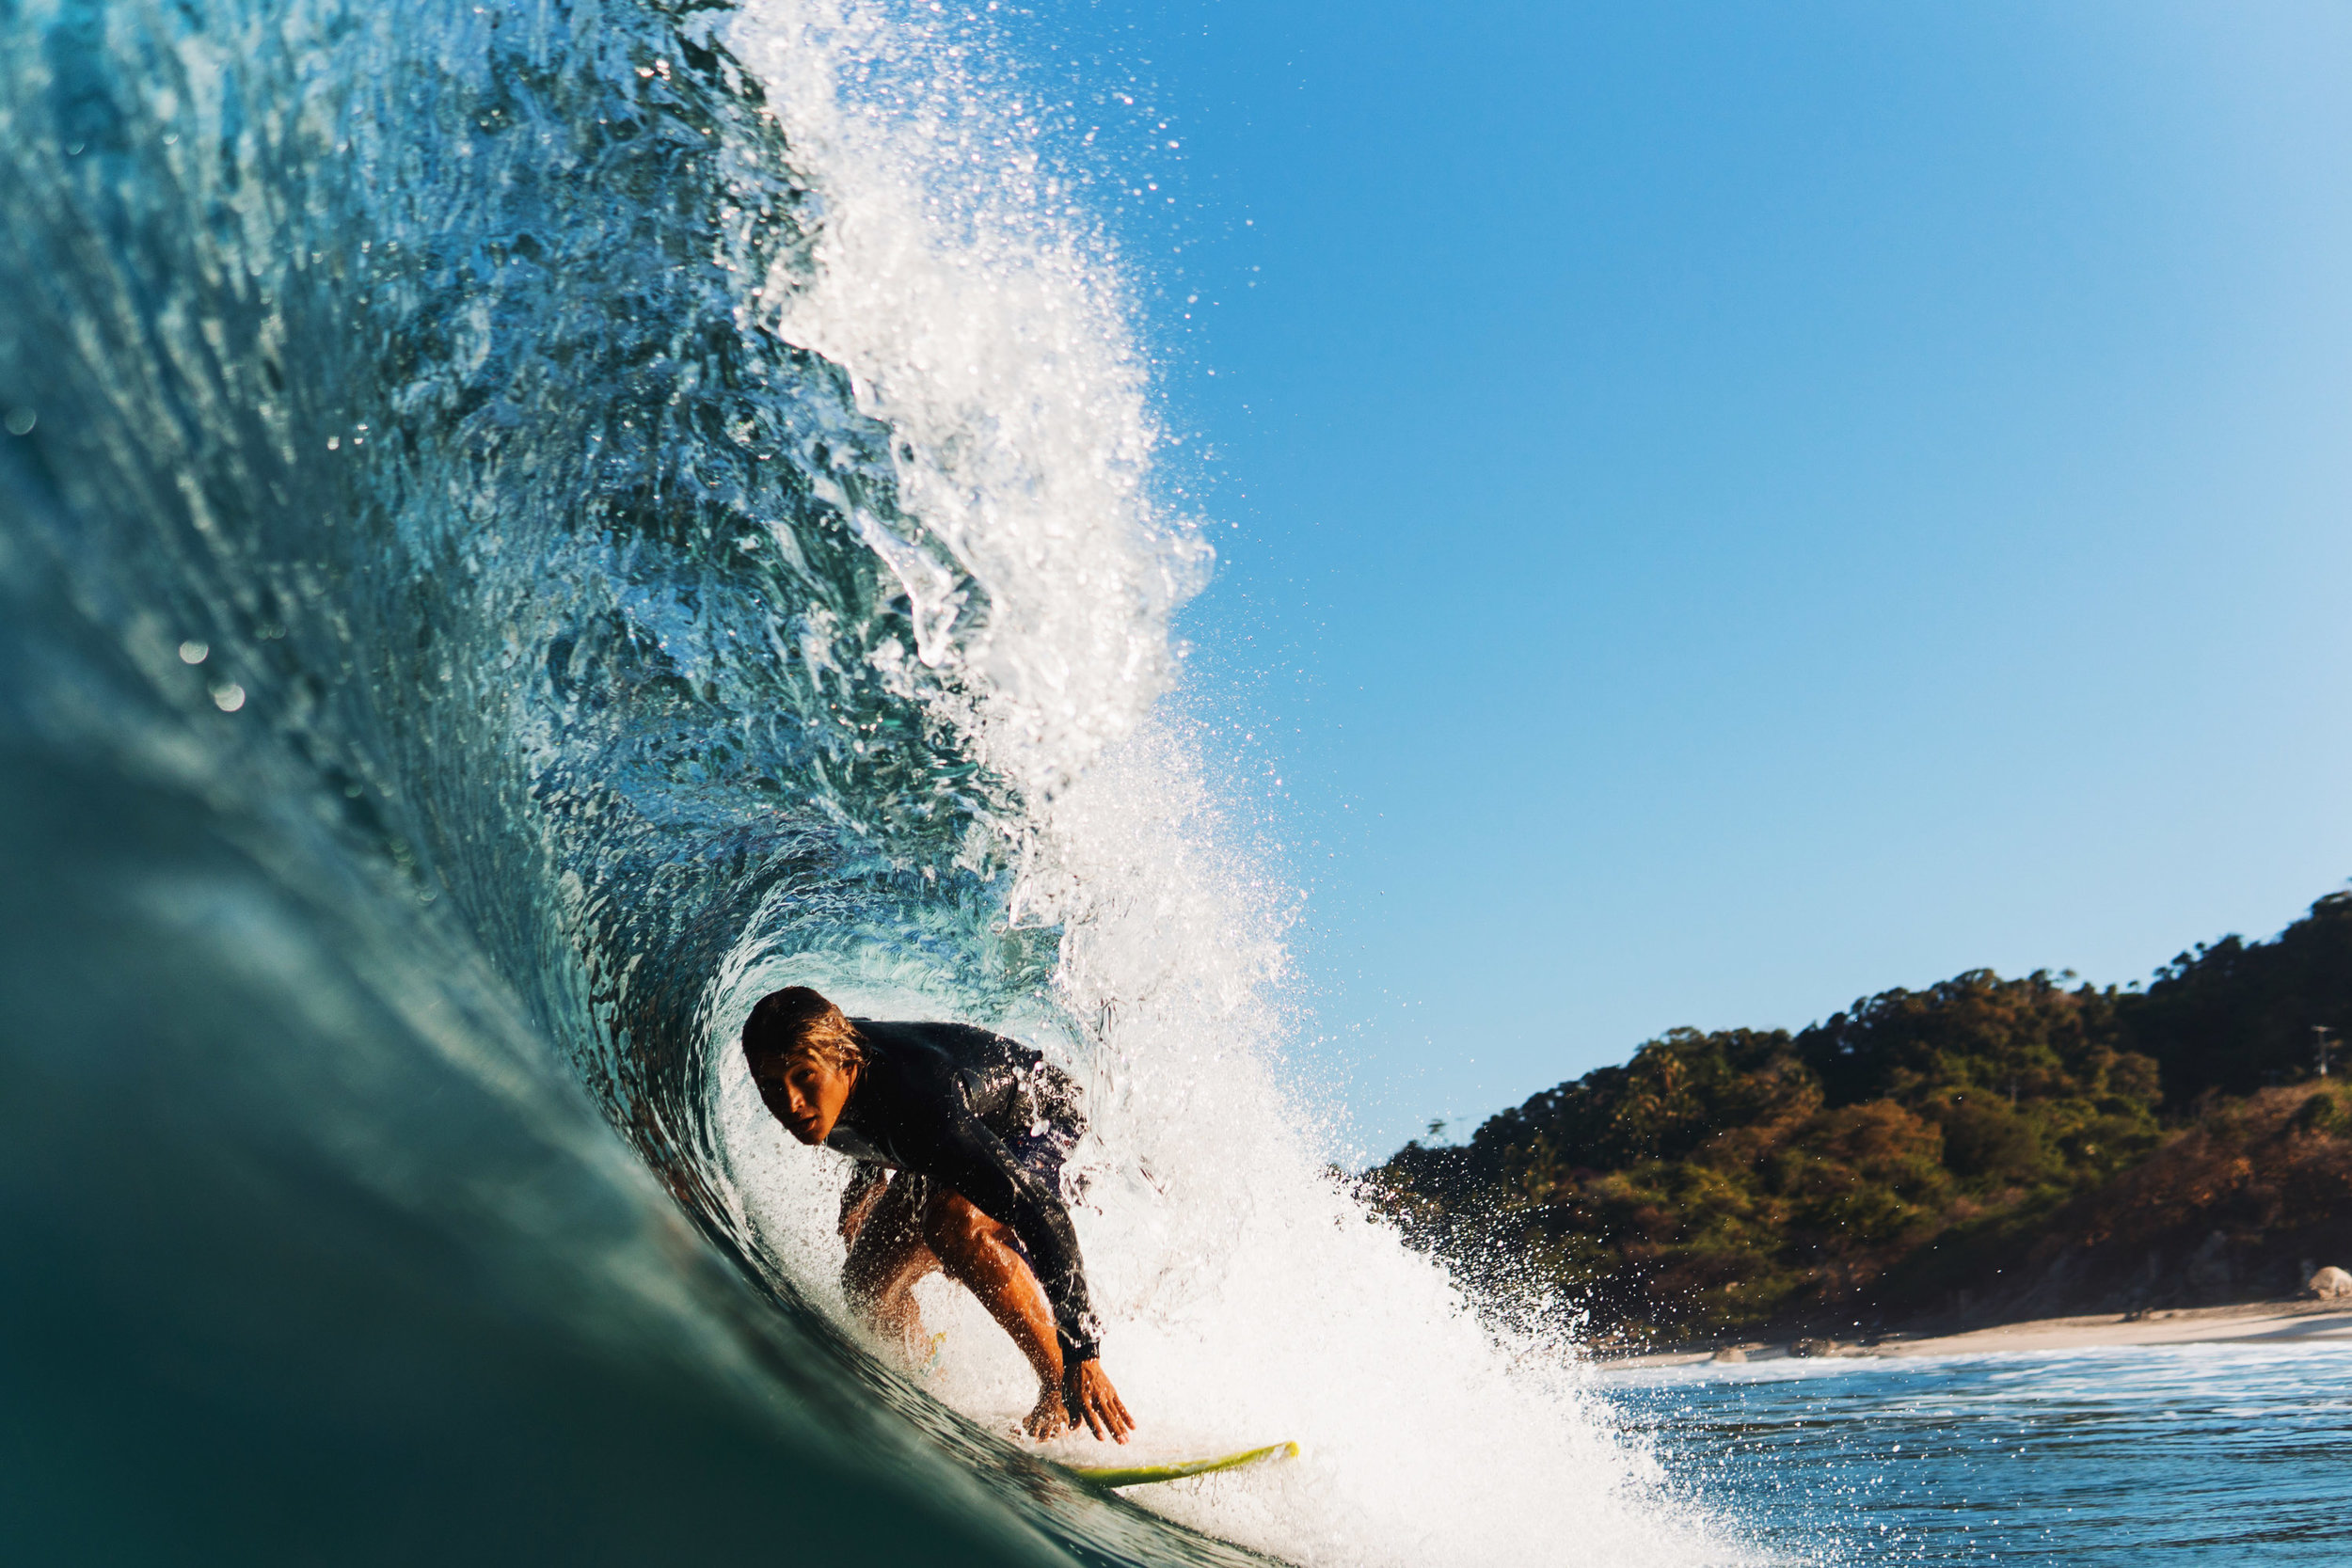 Surf-Mexico-Zihuatanejo-Sayulita-Ixtapa-Zihuatanejo-Diego-Cadena-Olas-Fotografia-Heiko-Bothe-65.jpg